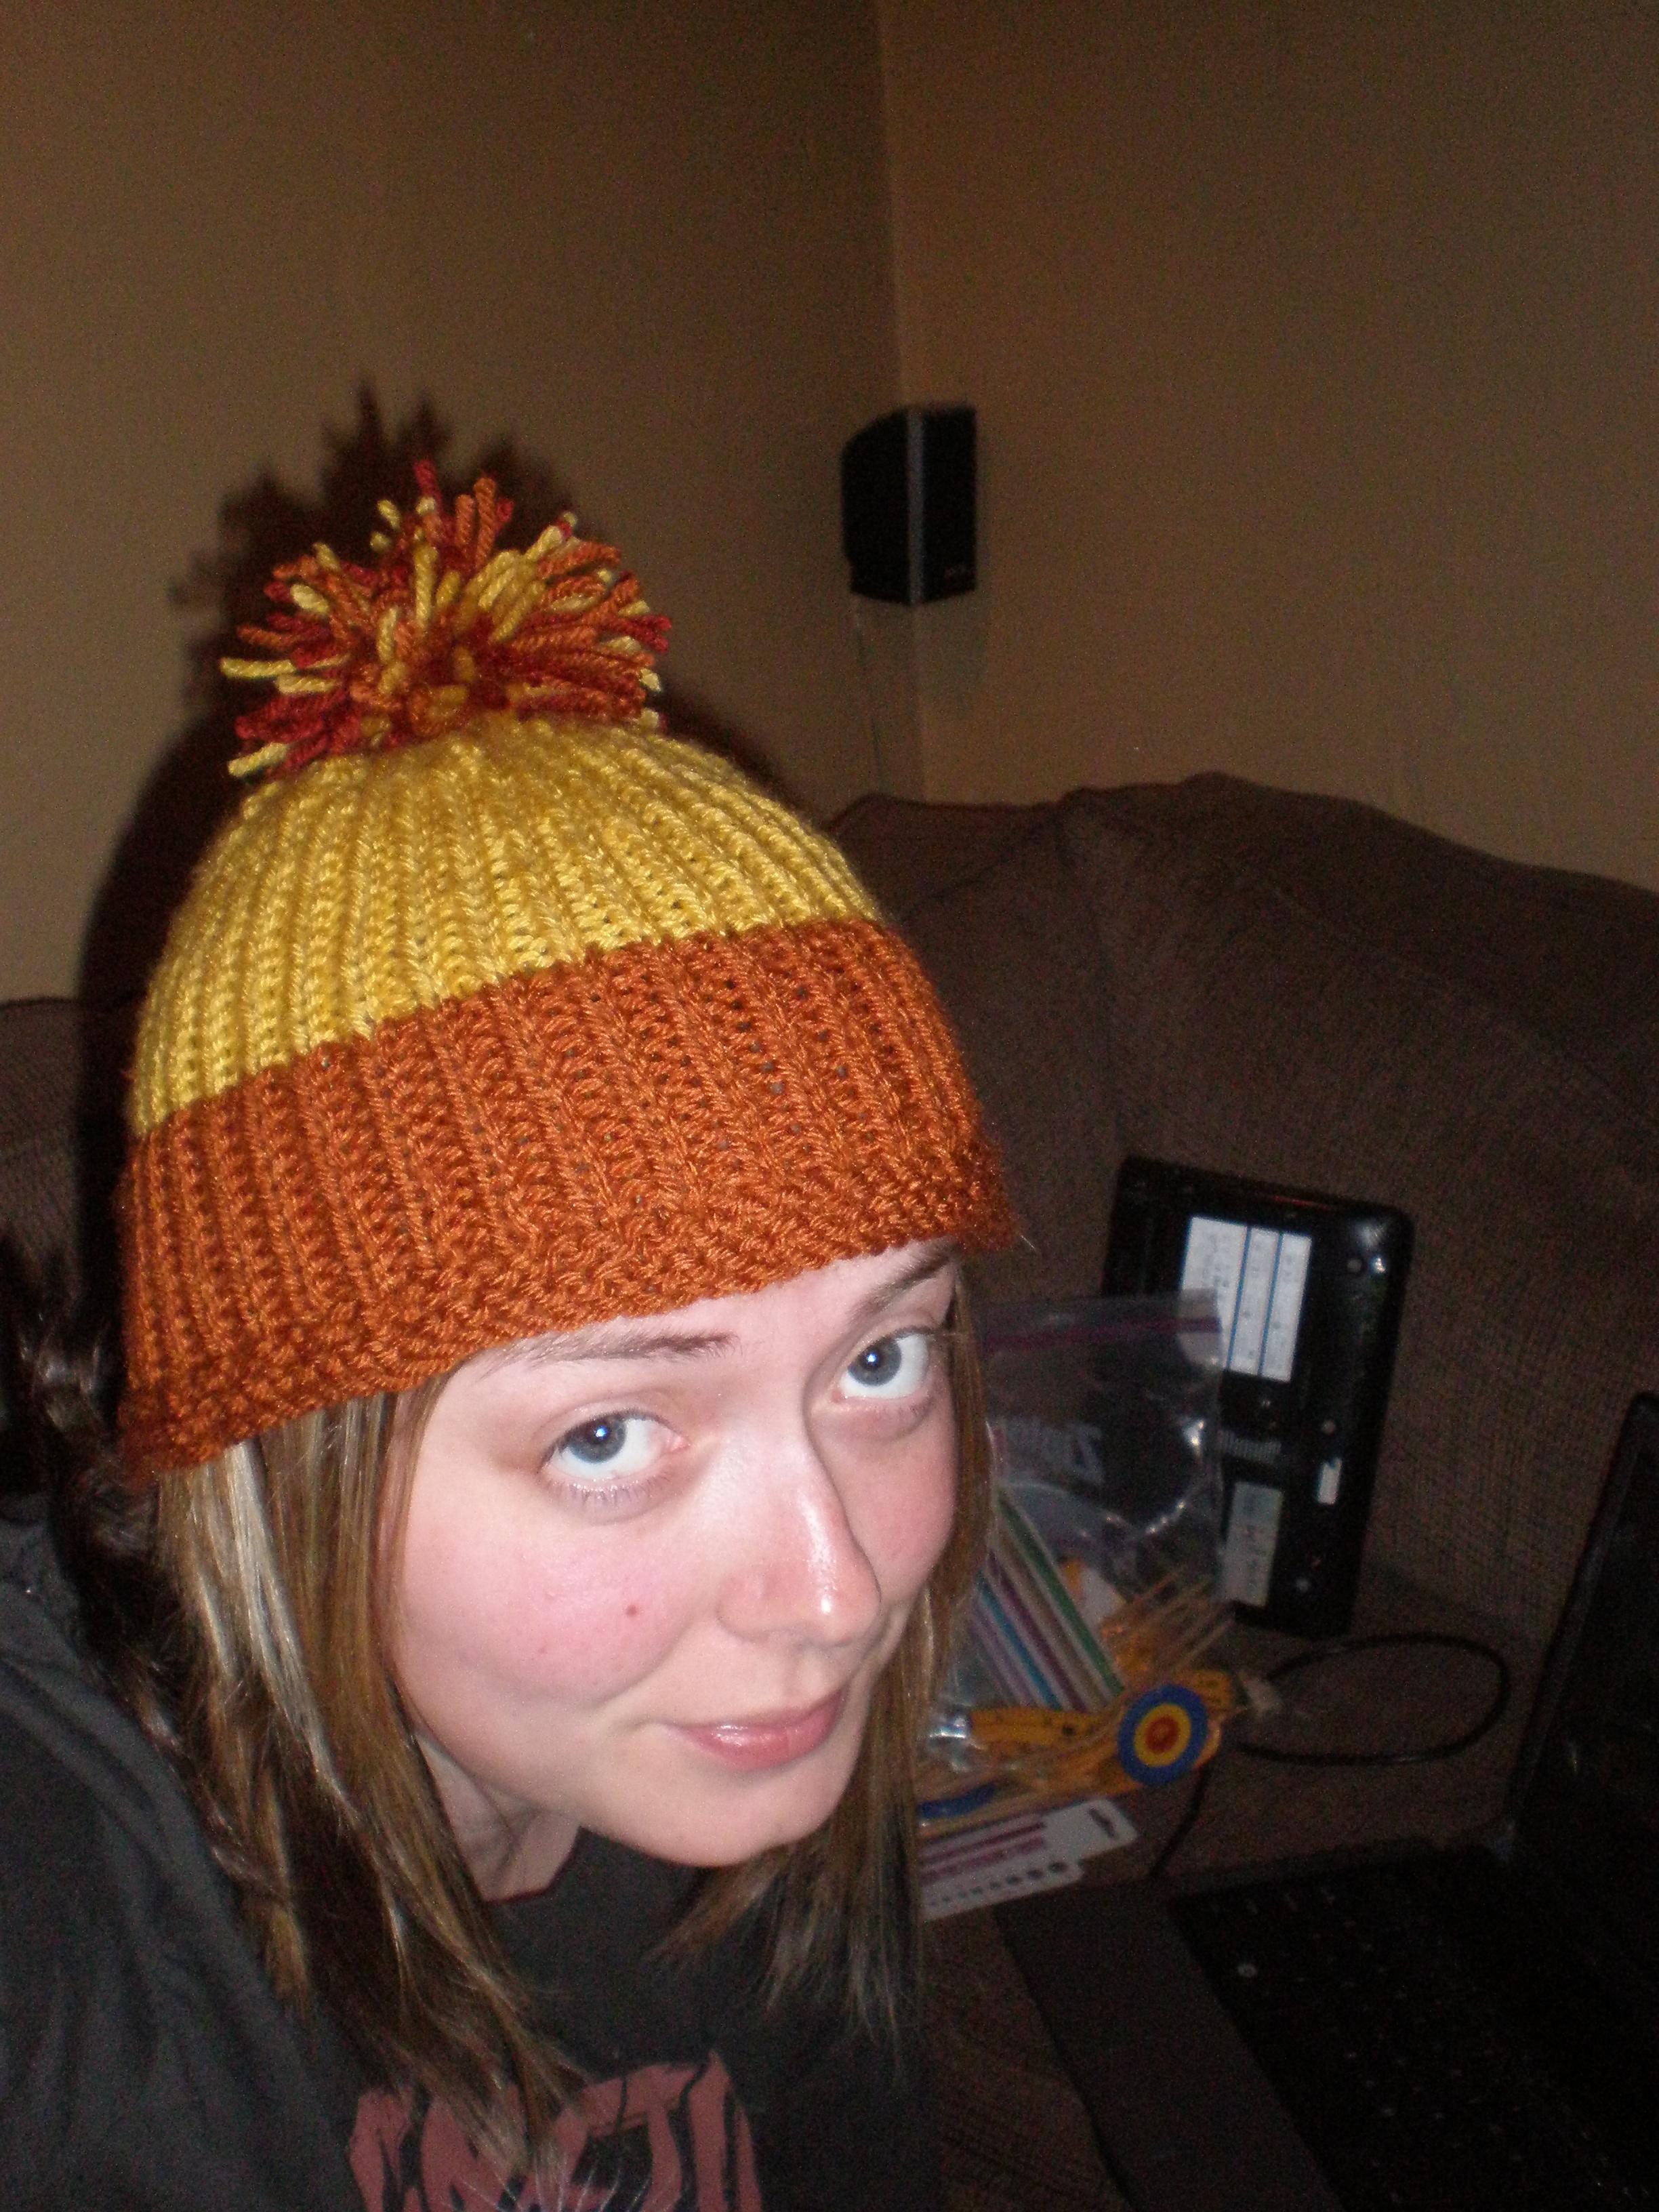 Jayne Cobb Hat: Installment One Tiny Heroes